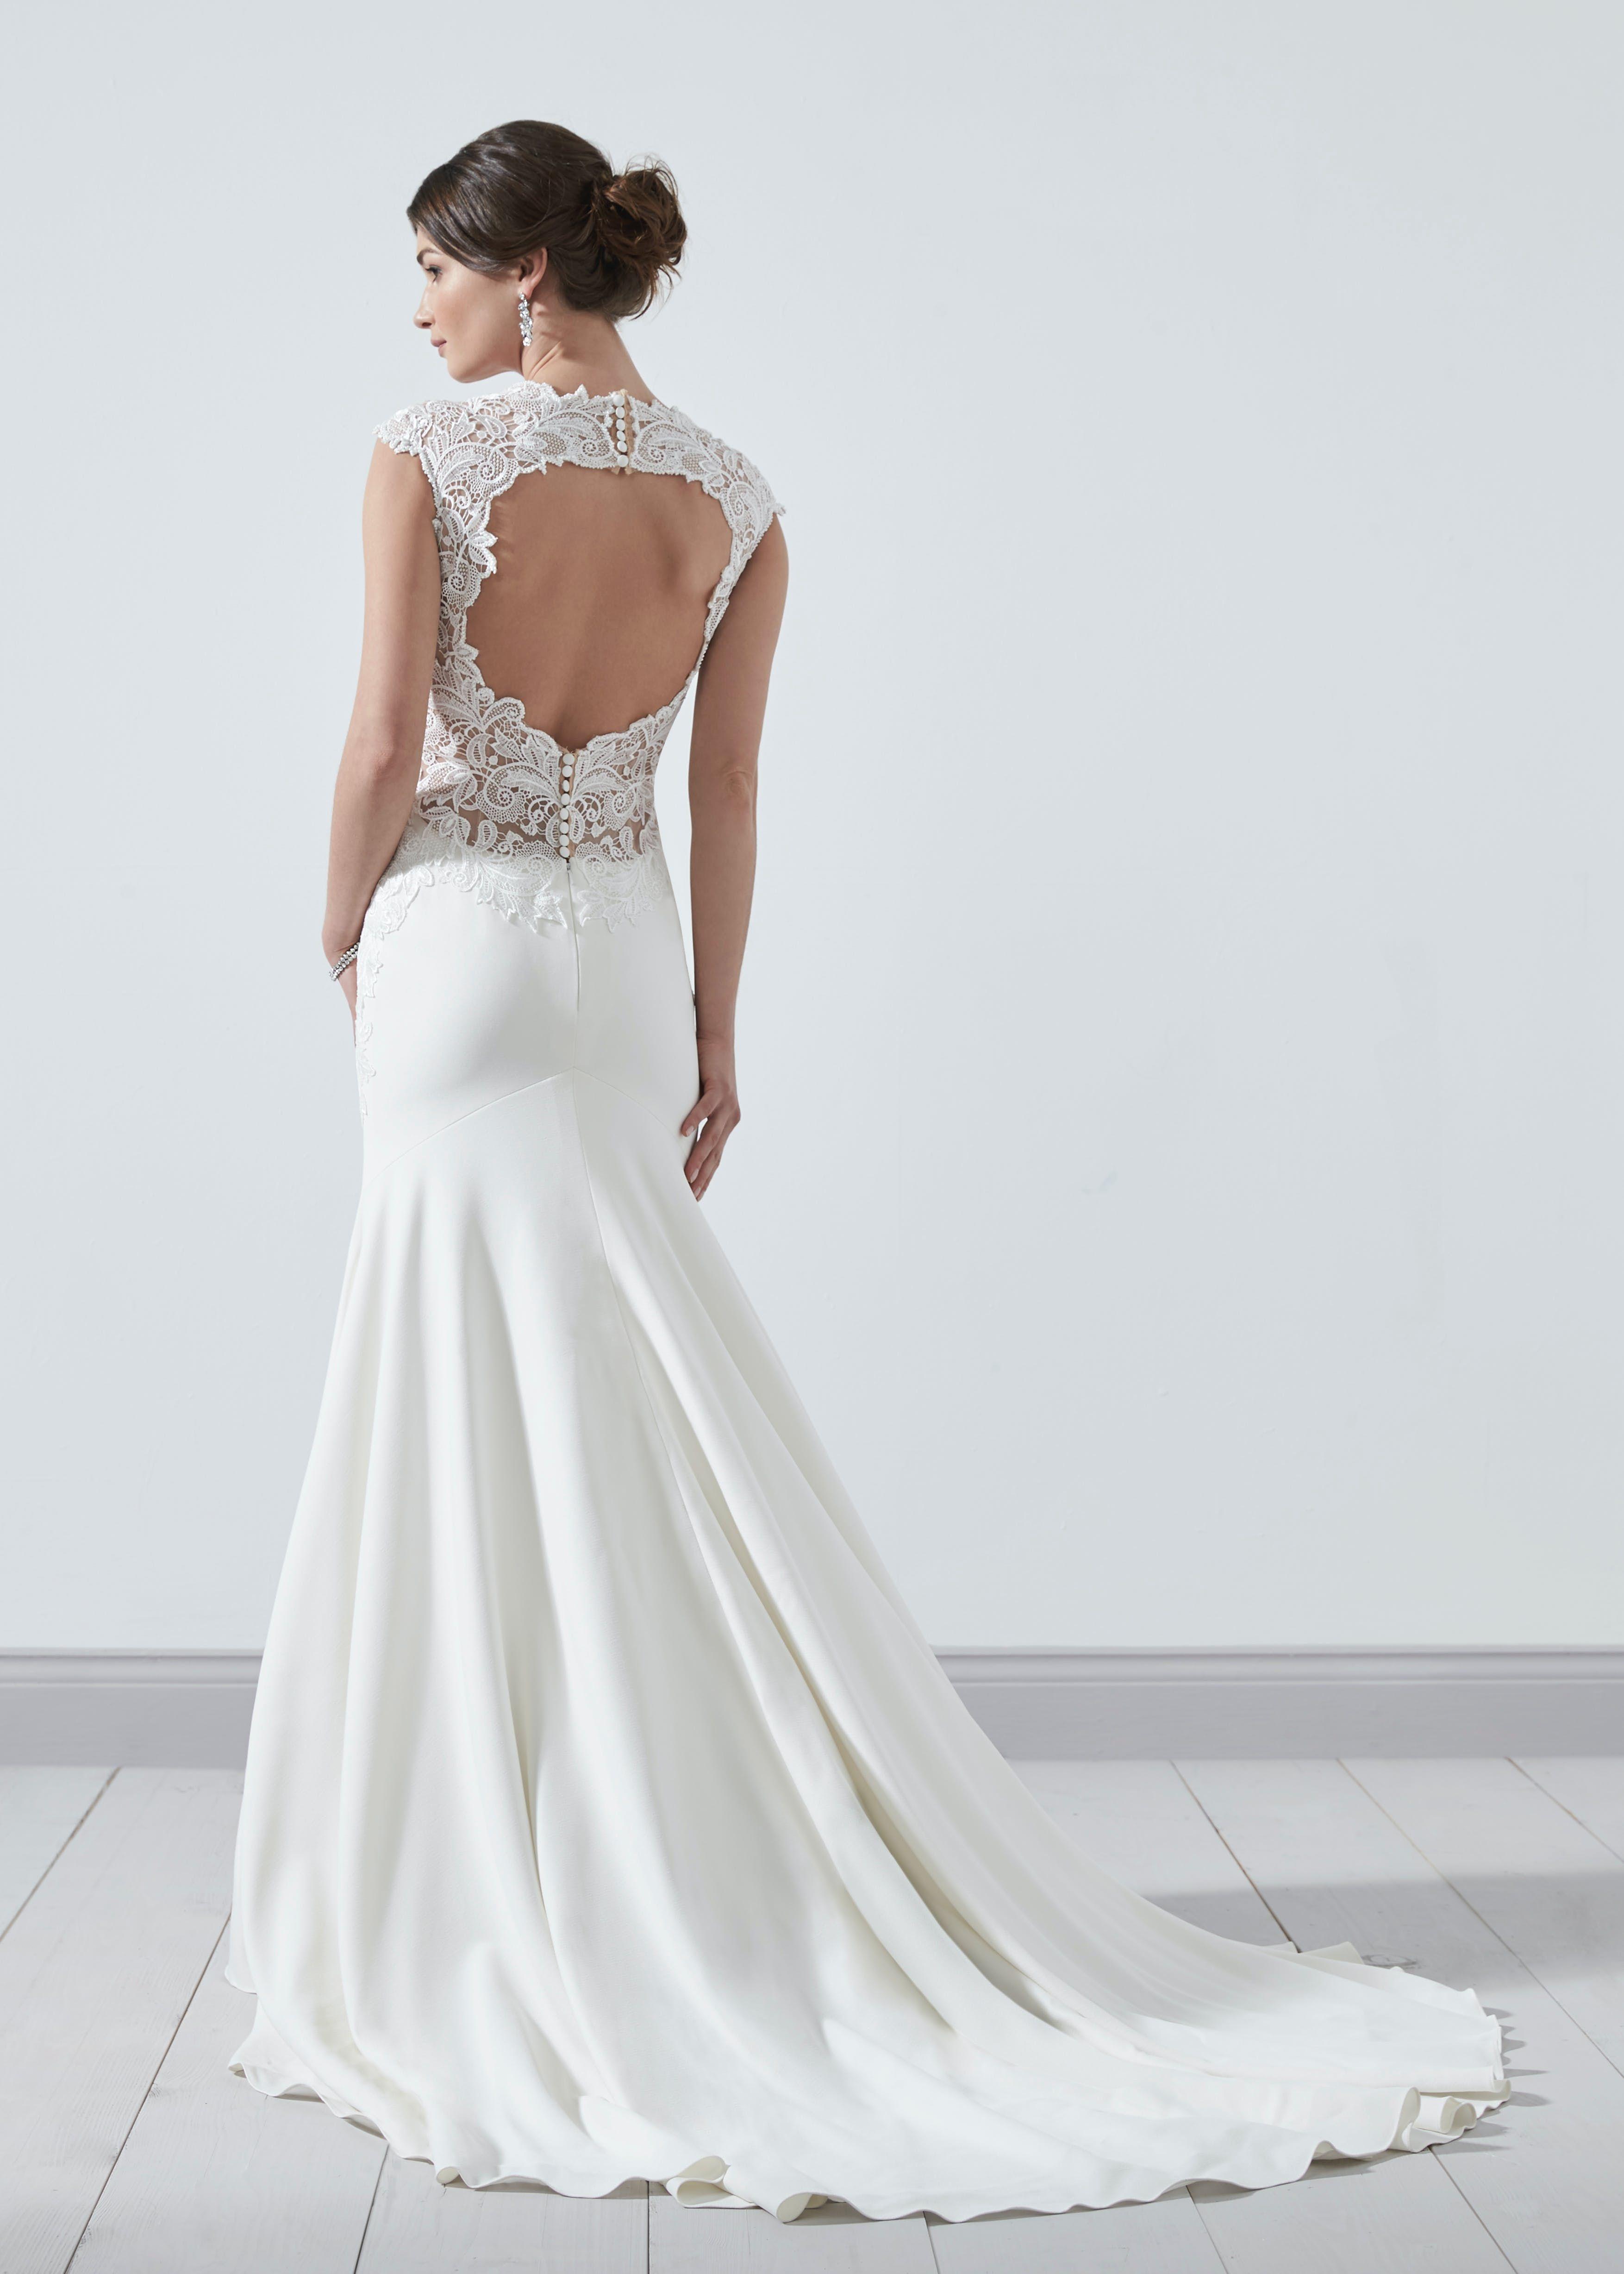 Pin By Kristina Konig On Wedding In 2020 Keyhole Back Wedding Dress Wedding Dresses Dresses